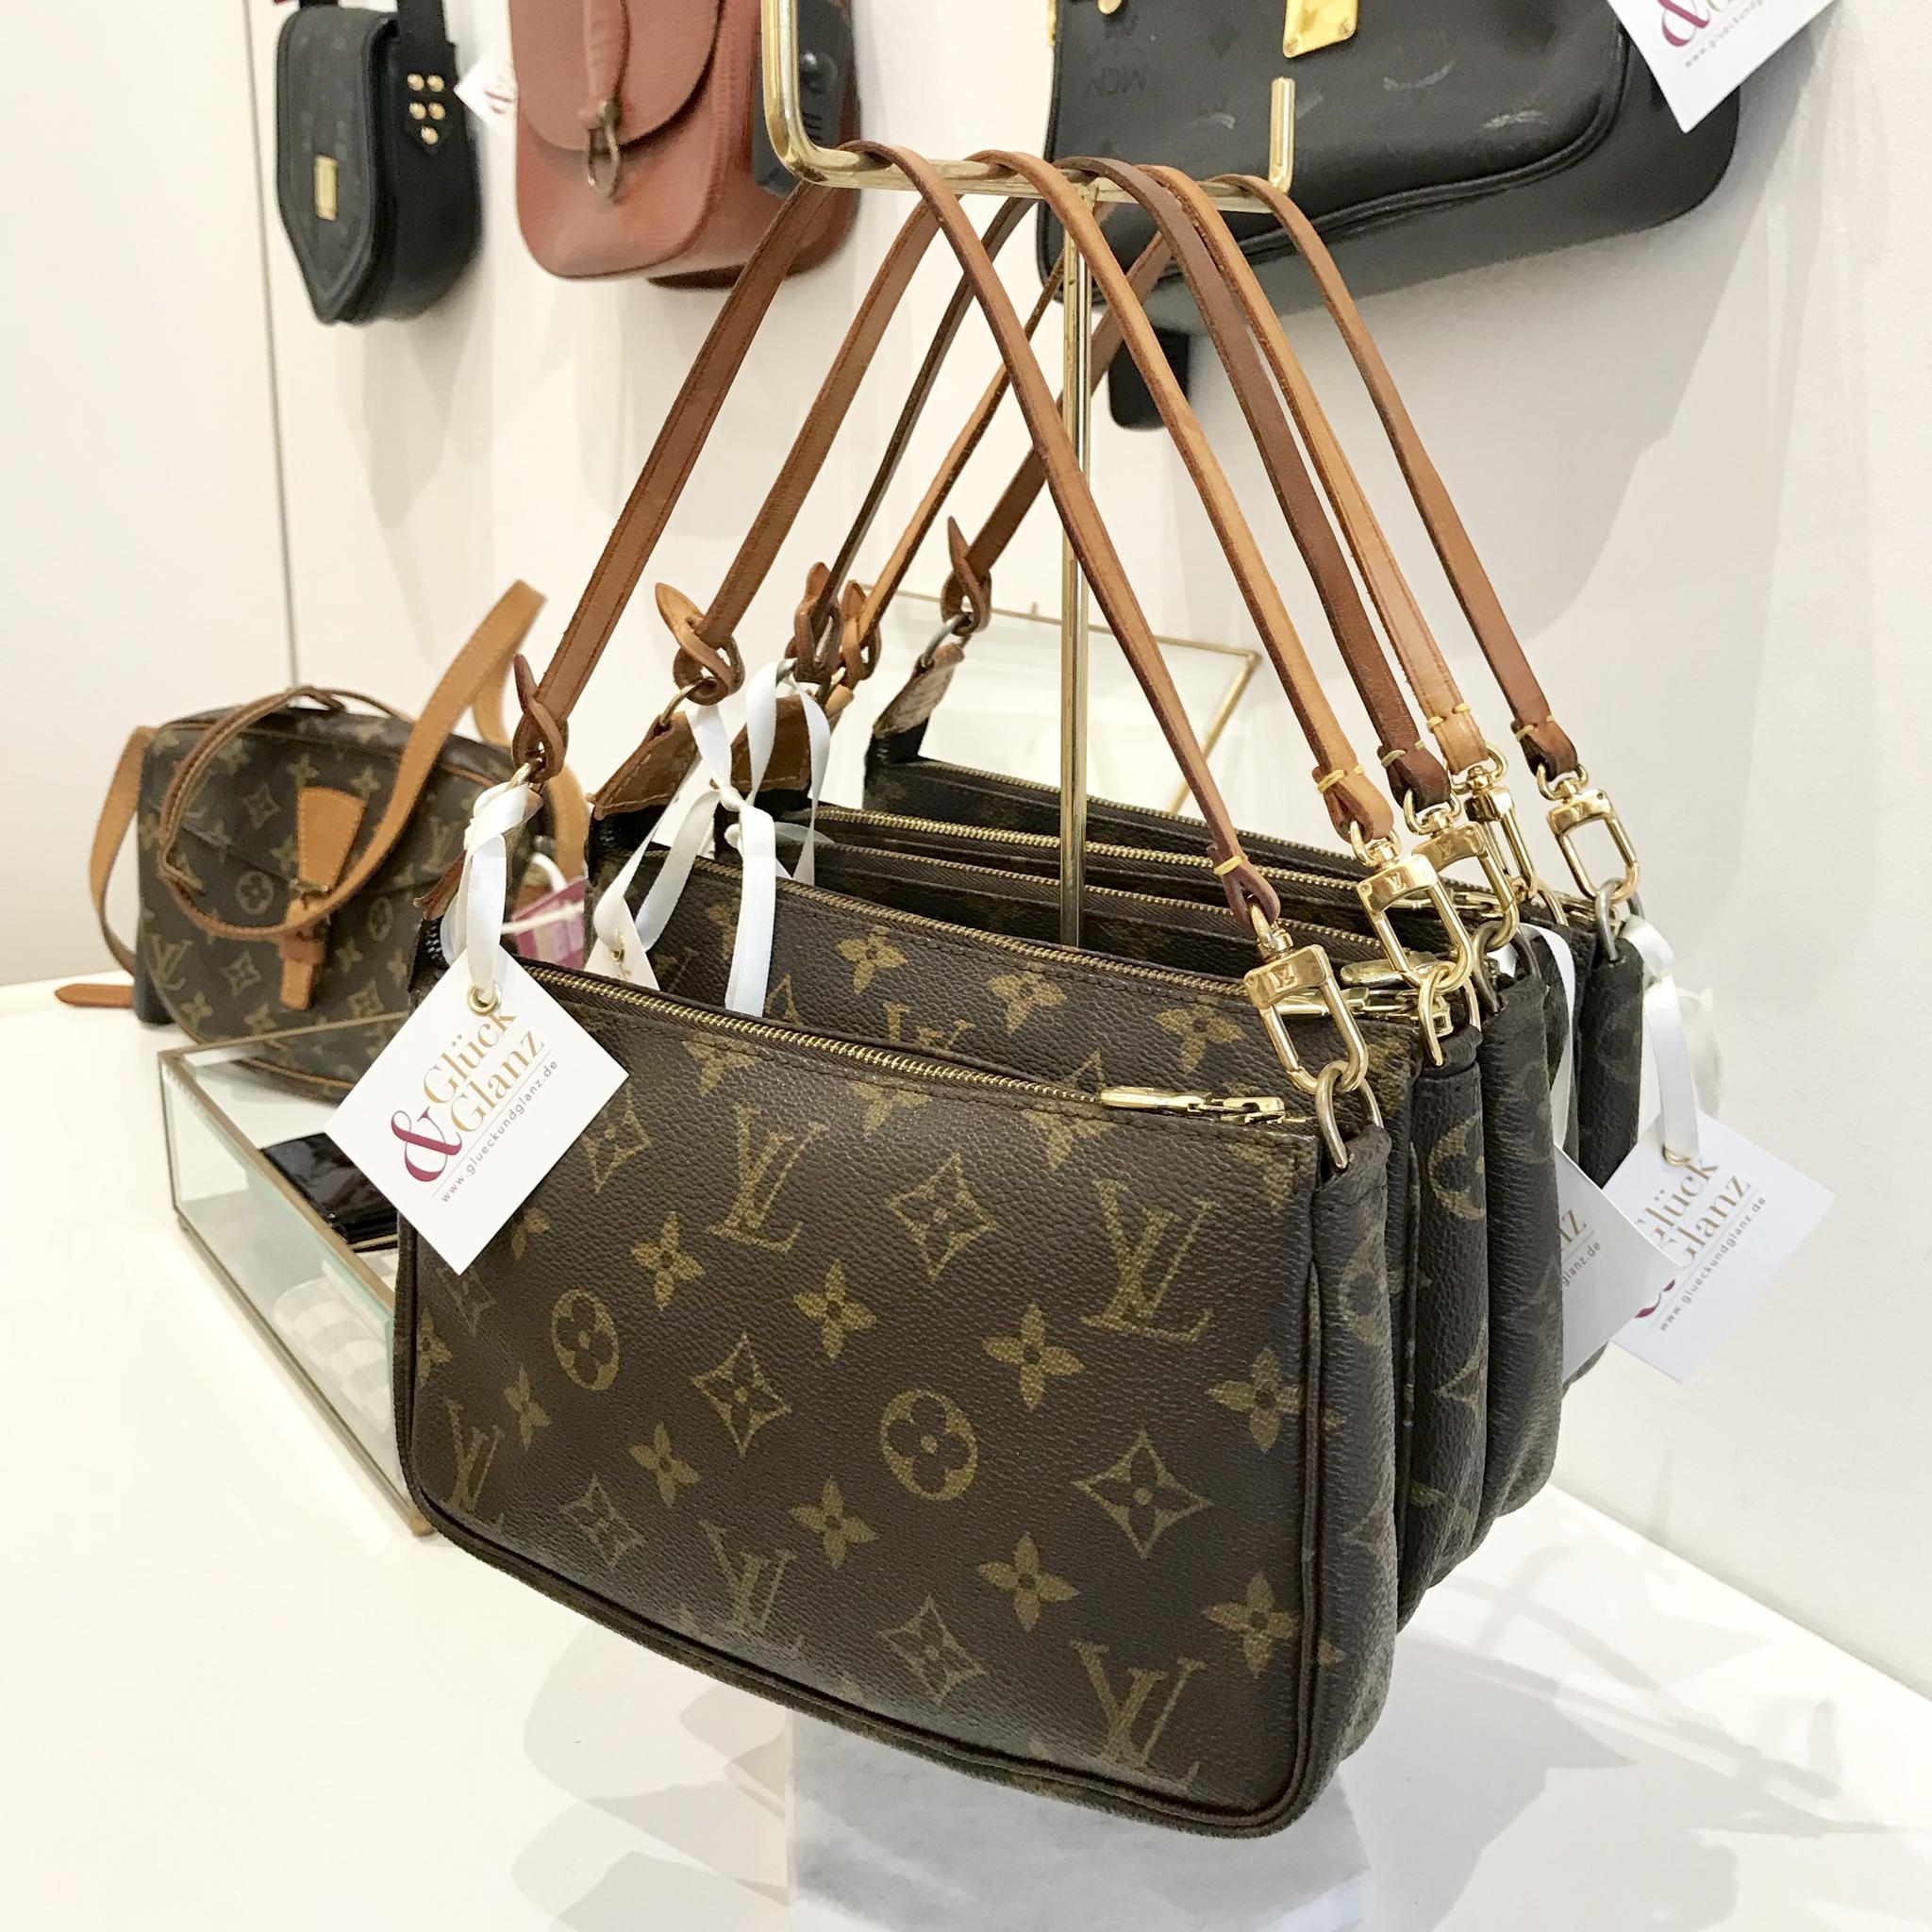 Louis Vuitton Klassiker Designer Second Hand Aus Koln Gluck Glanz